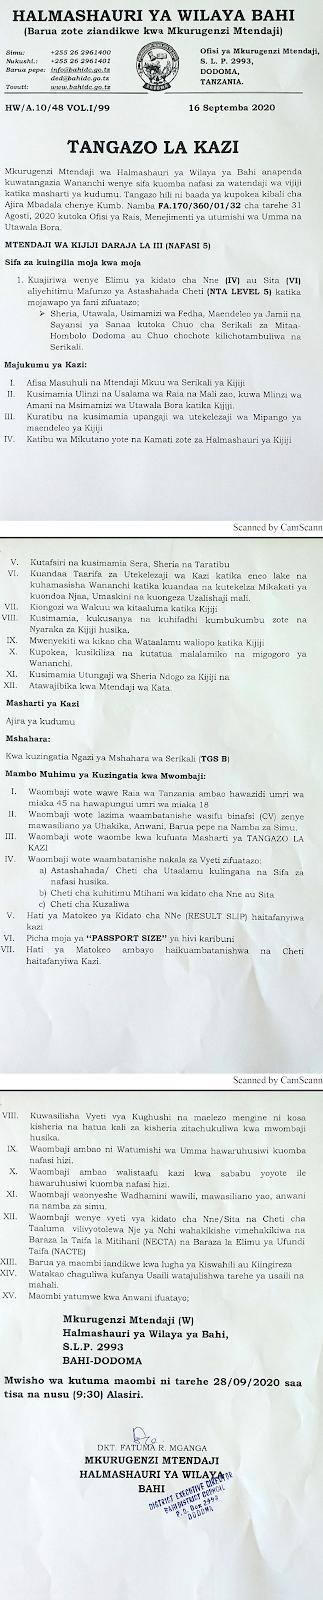 BAHI District Council Jobs (Watendaji 05)